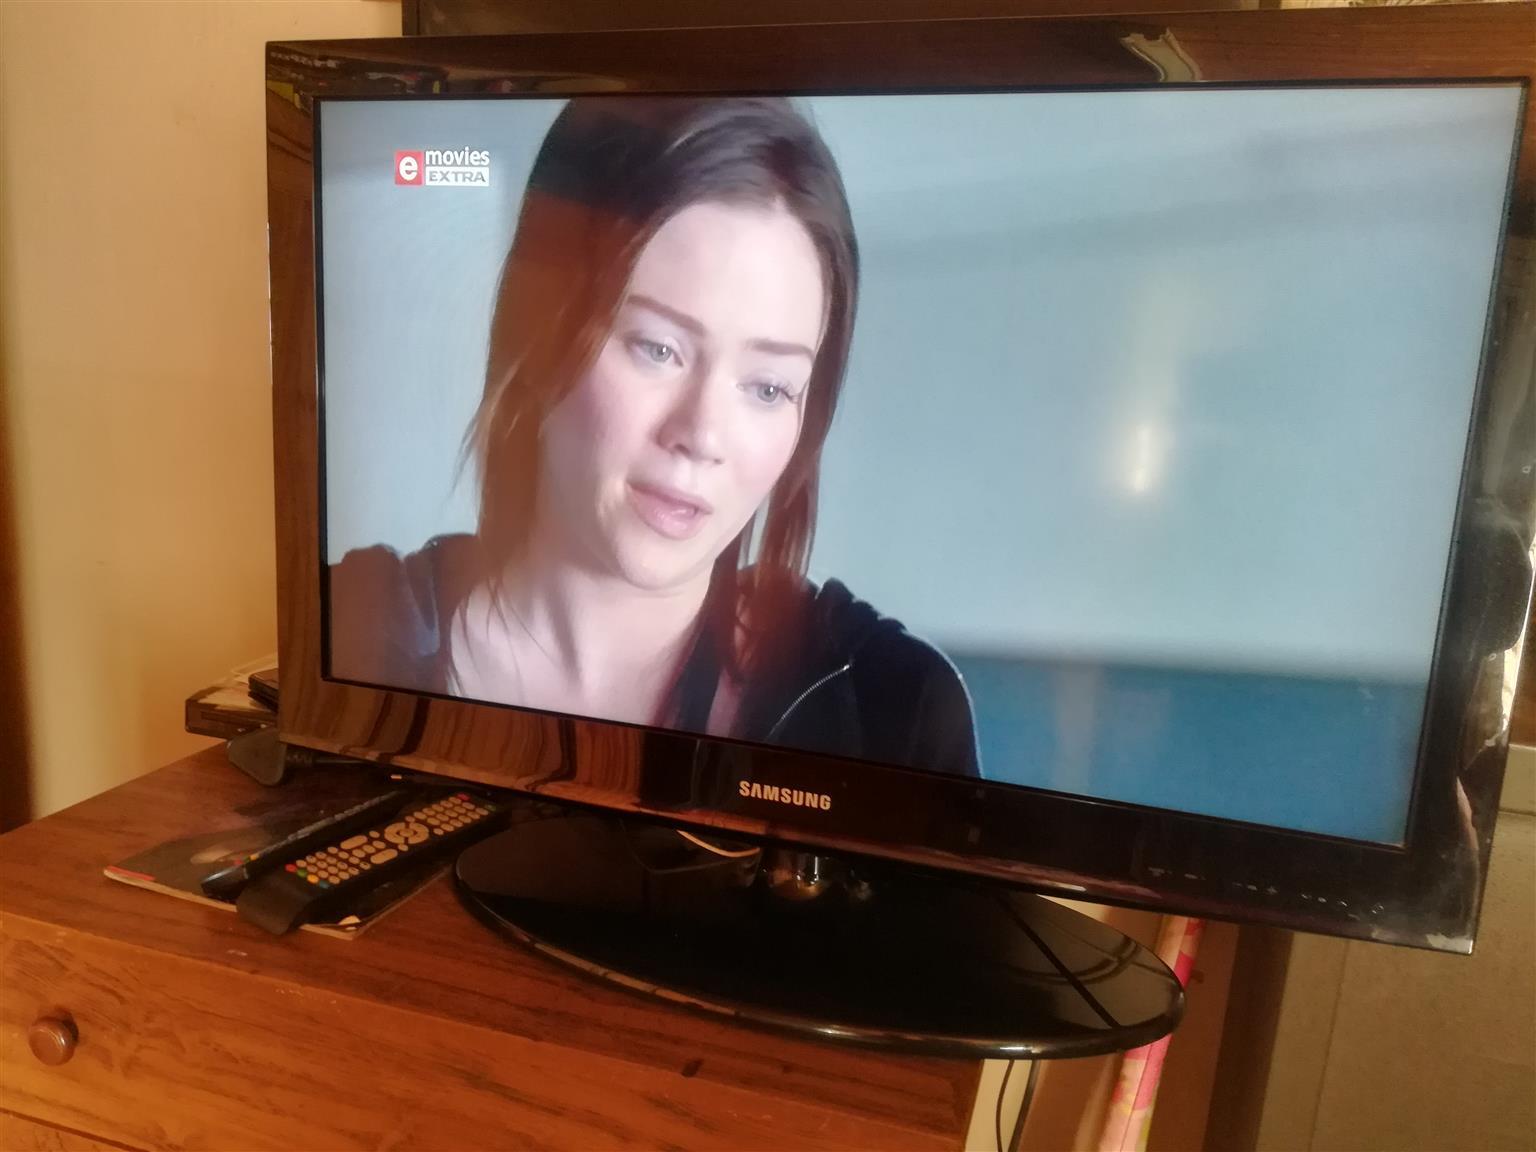 Samsung 32 inch HD ready TV met remote